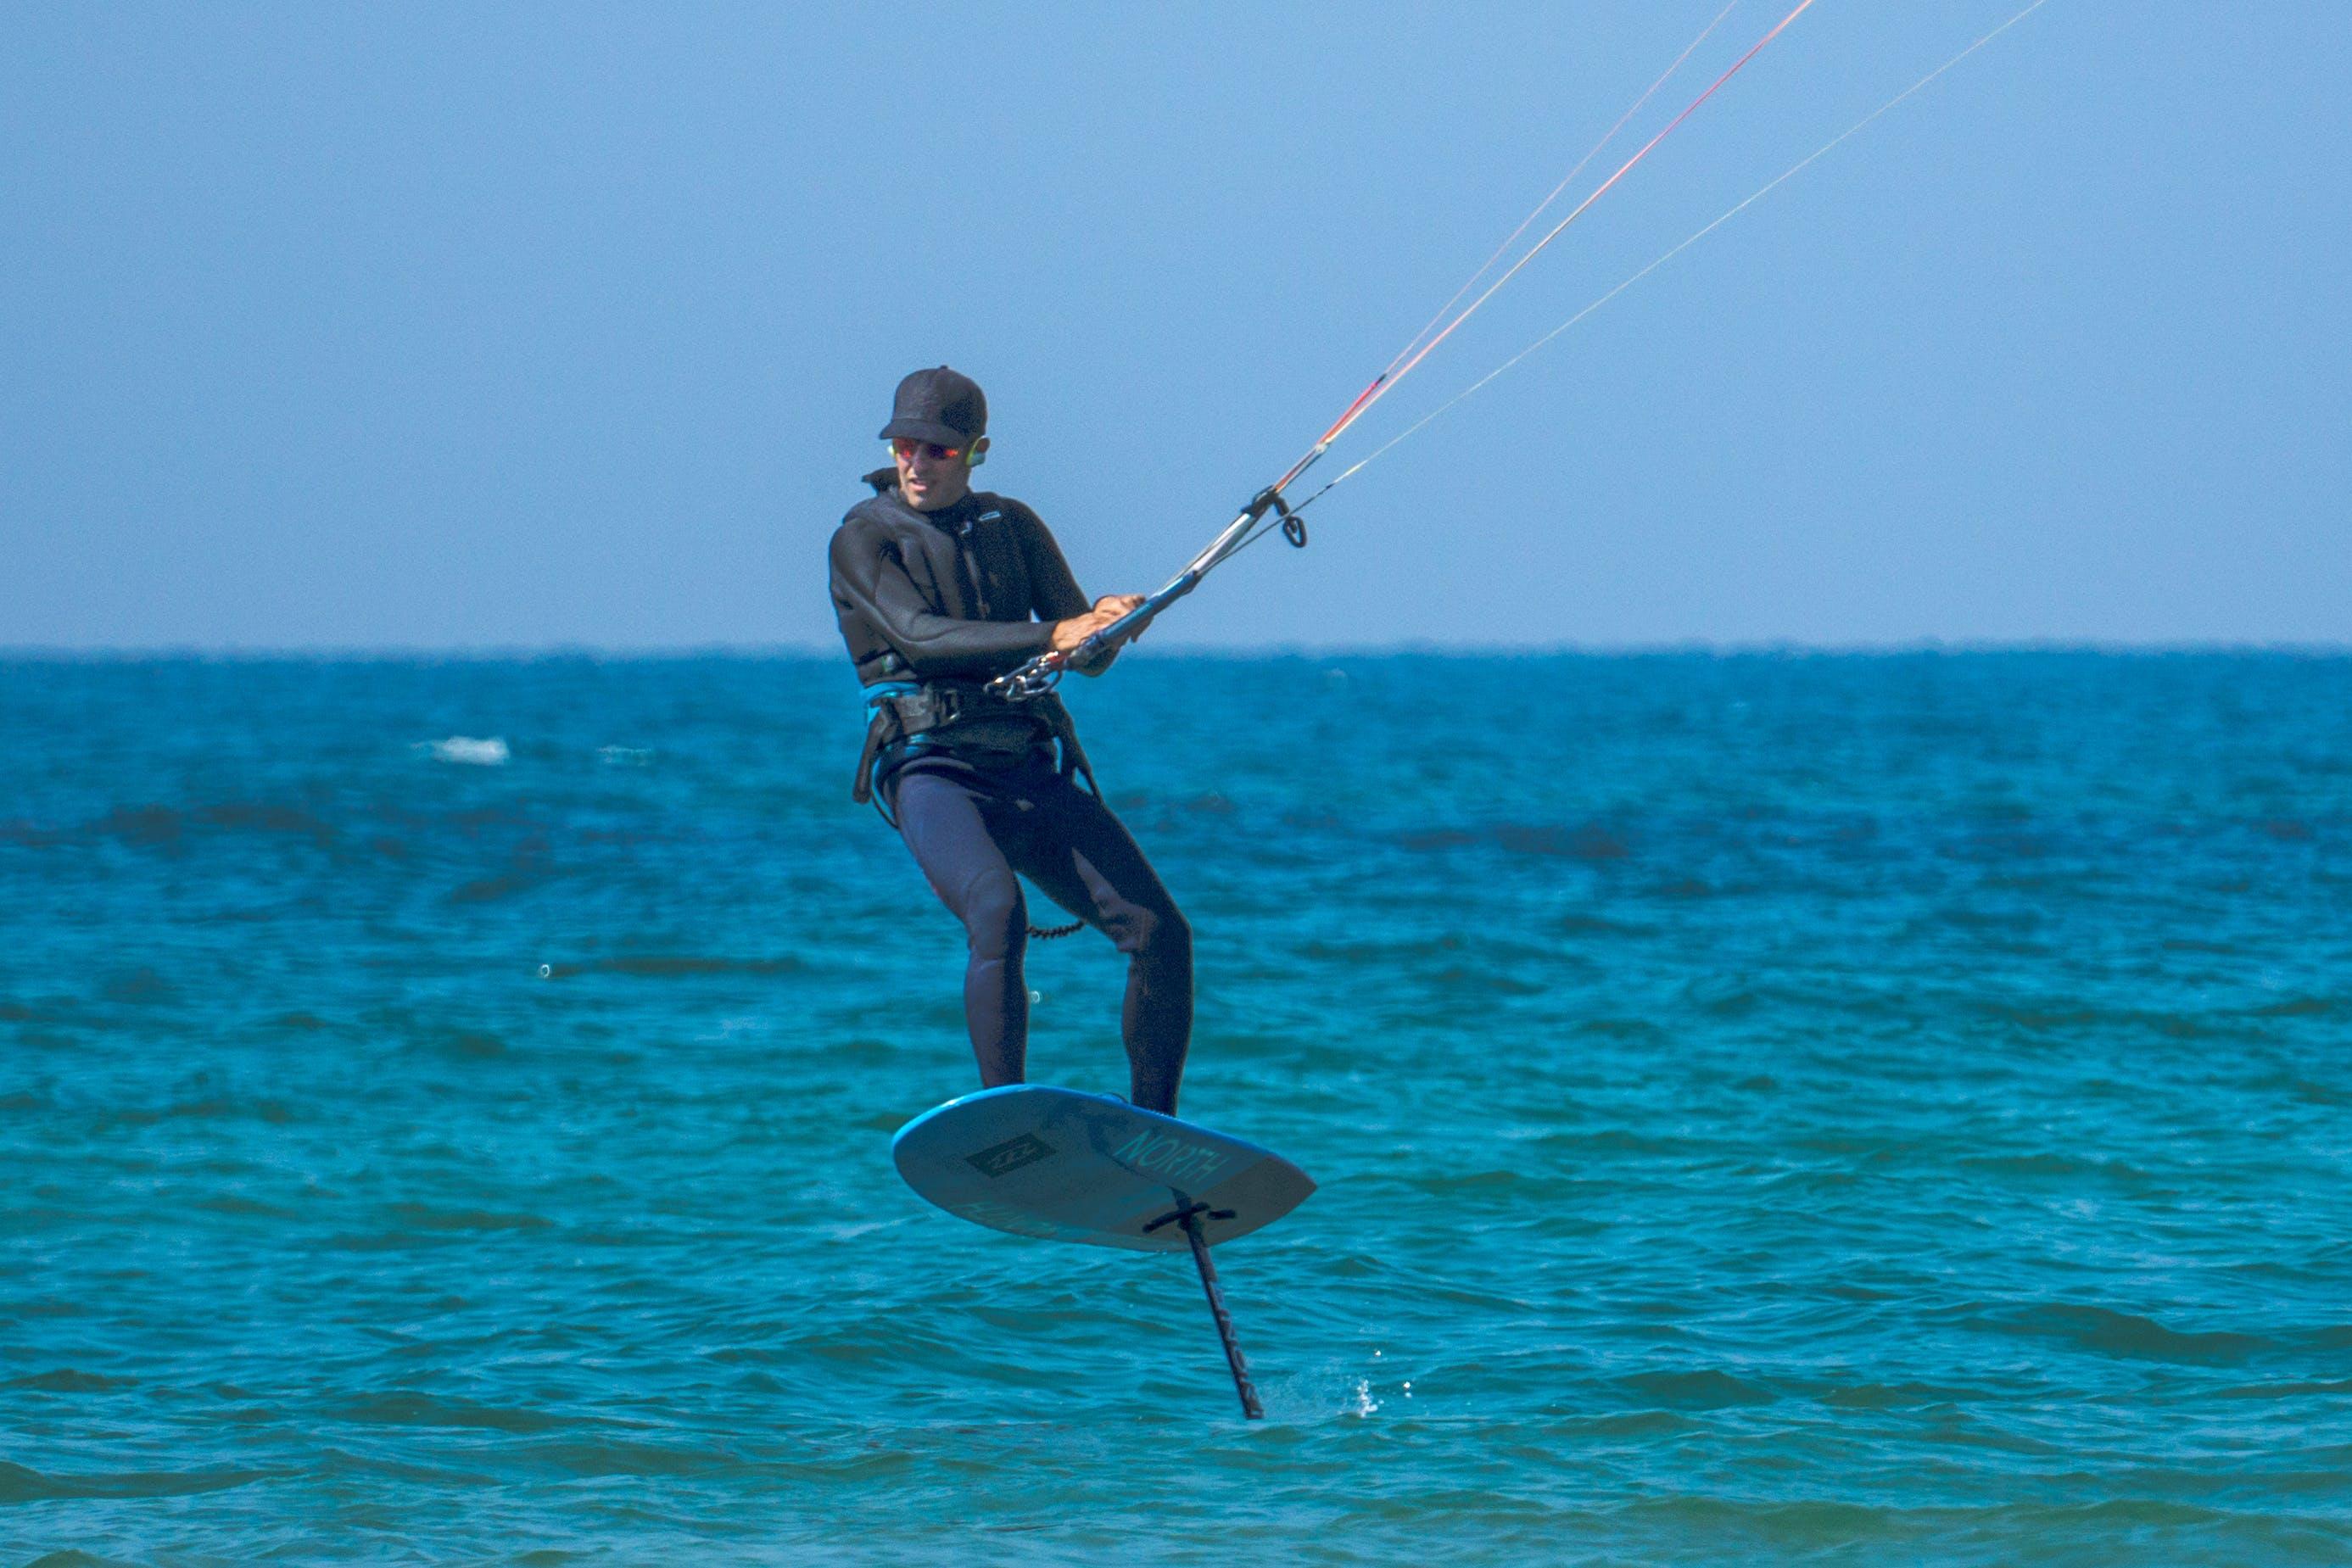 Free stock photo of kite surfing